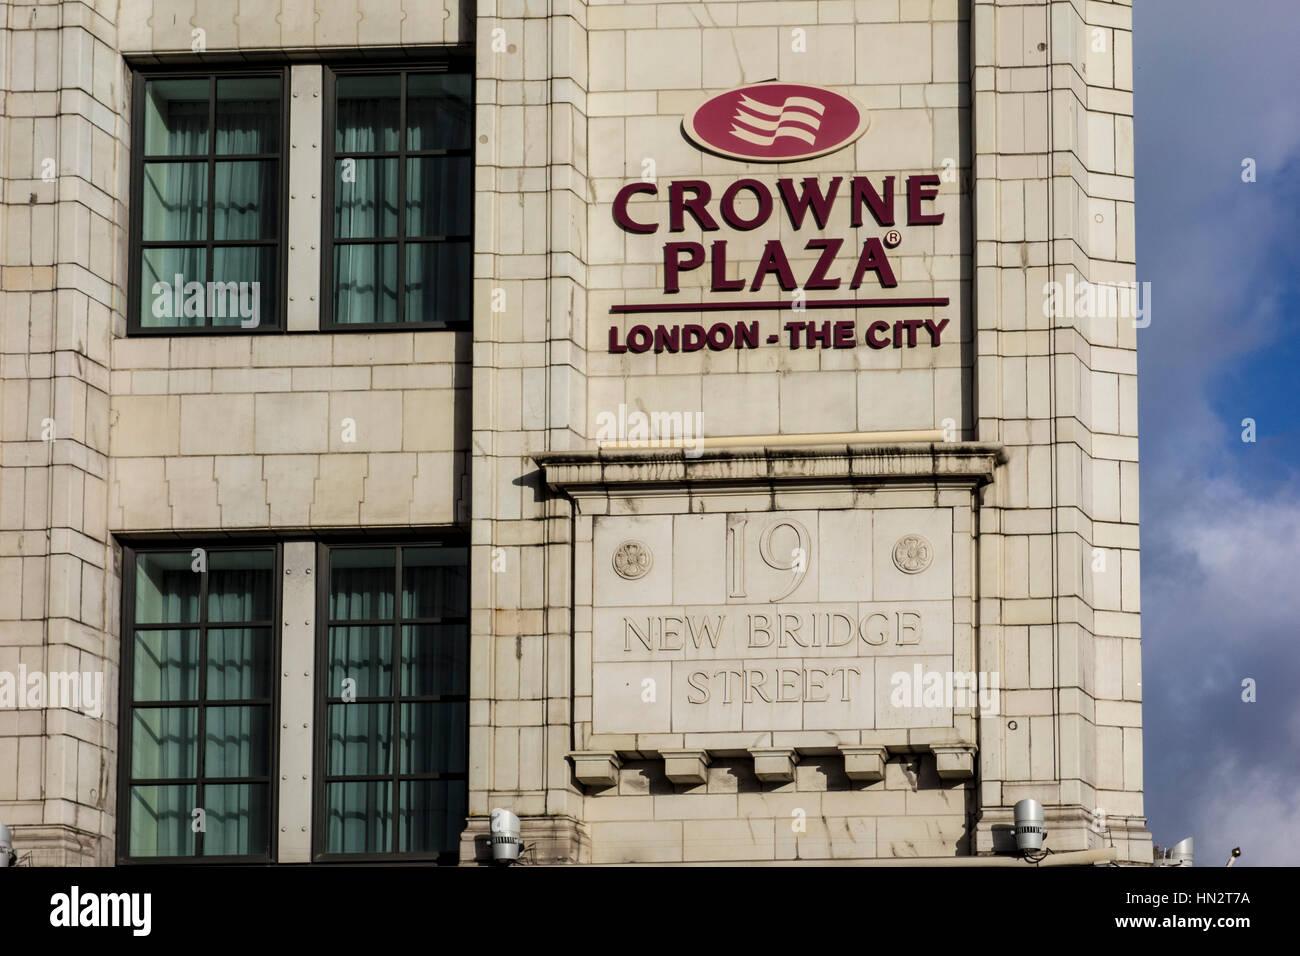 Crown Plaza London - The City hotel, City of London, UK - Stock Image